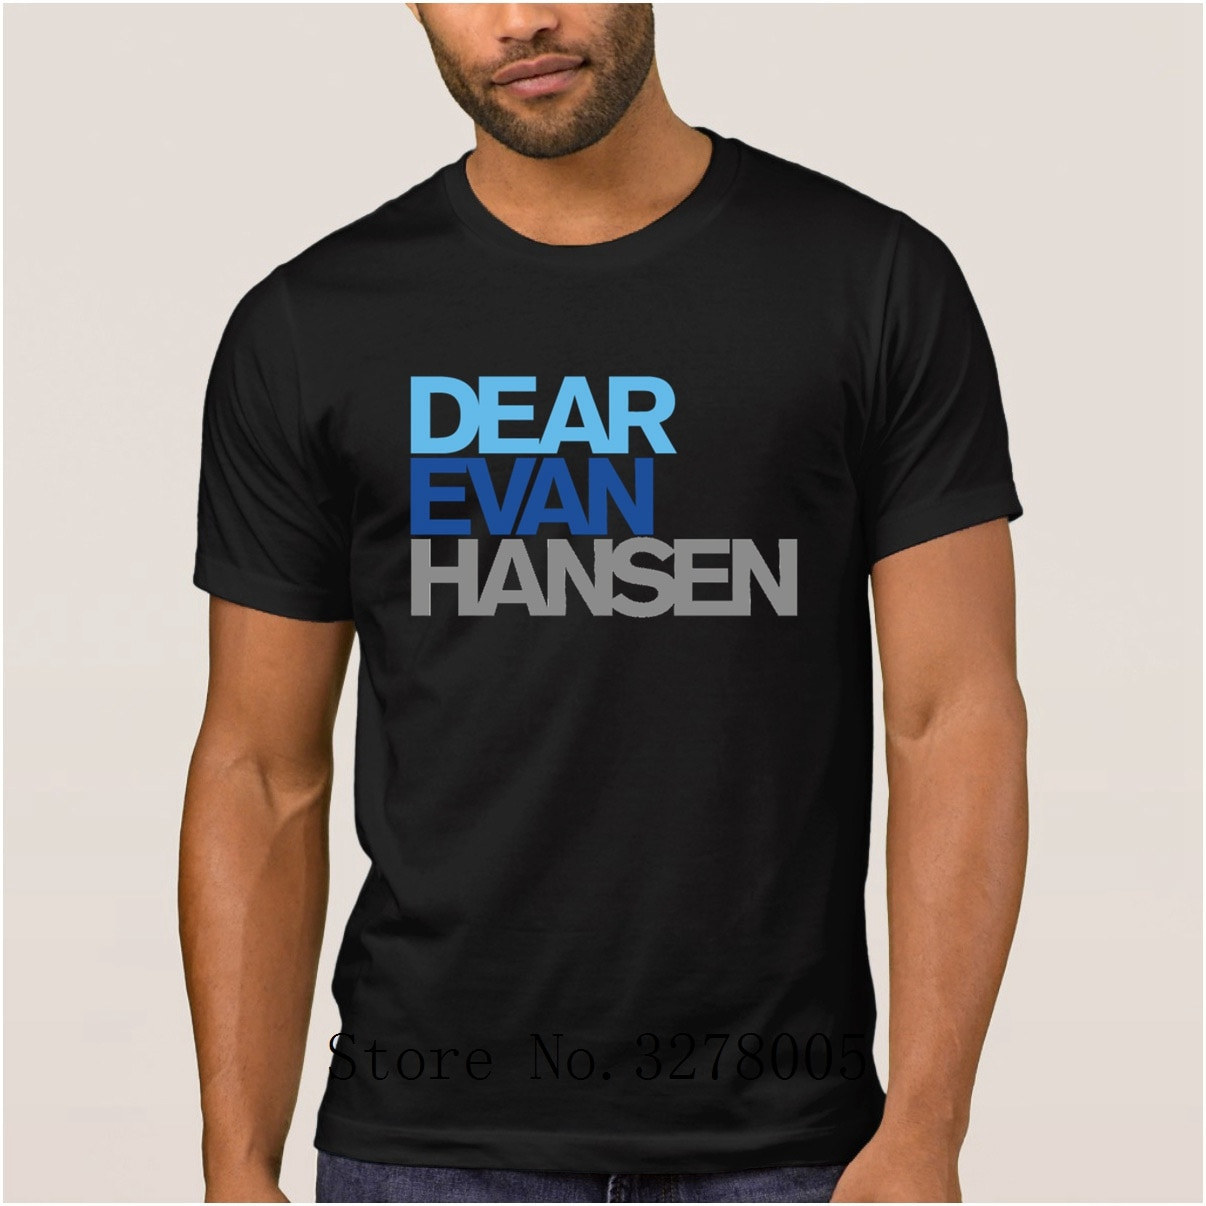 La Maxpa Strick-mode Herren T-shirt Liebe Evan Hansen regelmäßige T-Shirt Für Männer Frühling Herbst 100% Baumwolle Bekleidung T-shirt herren